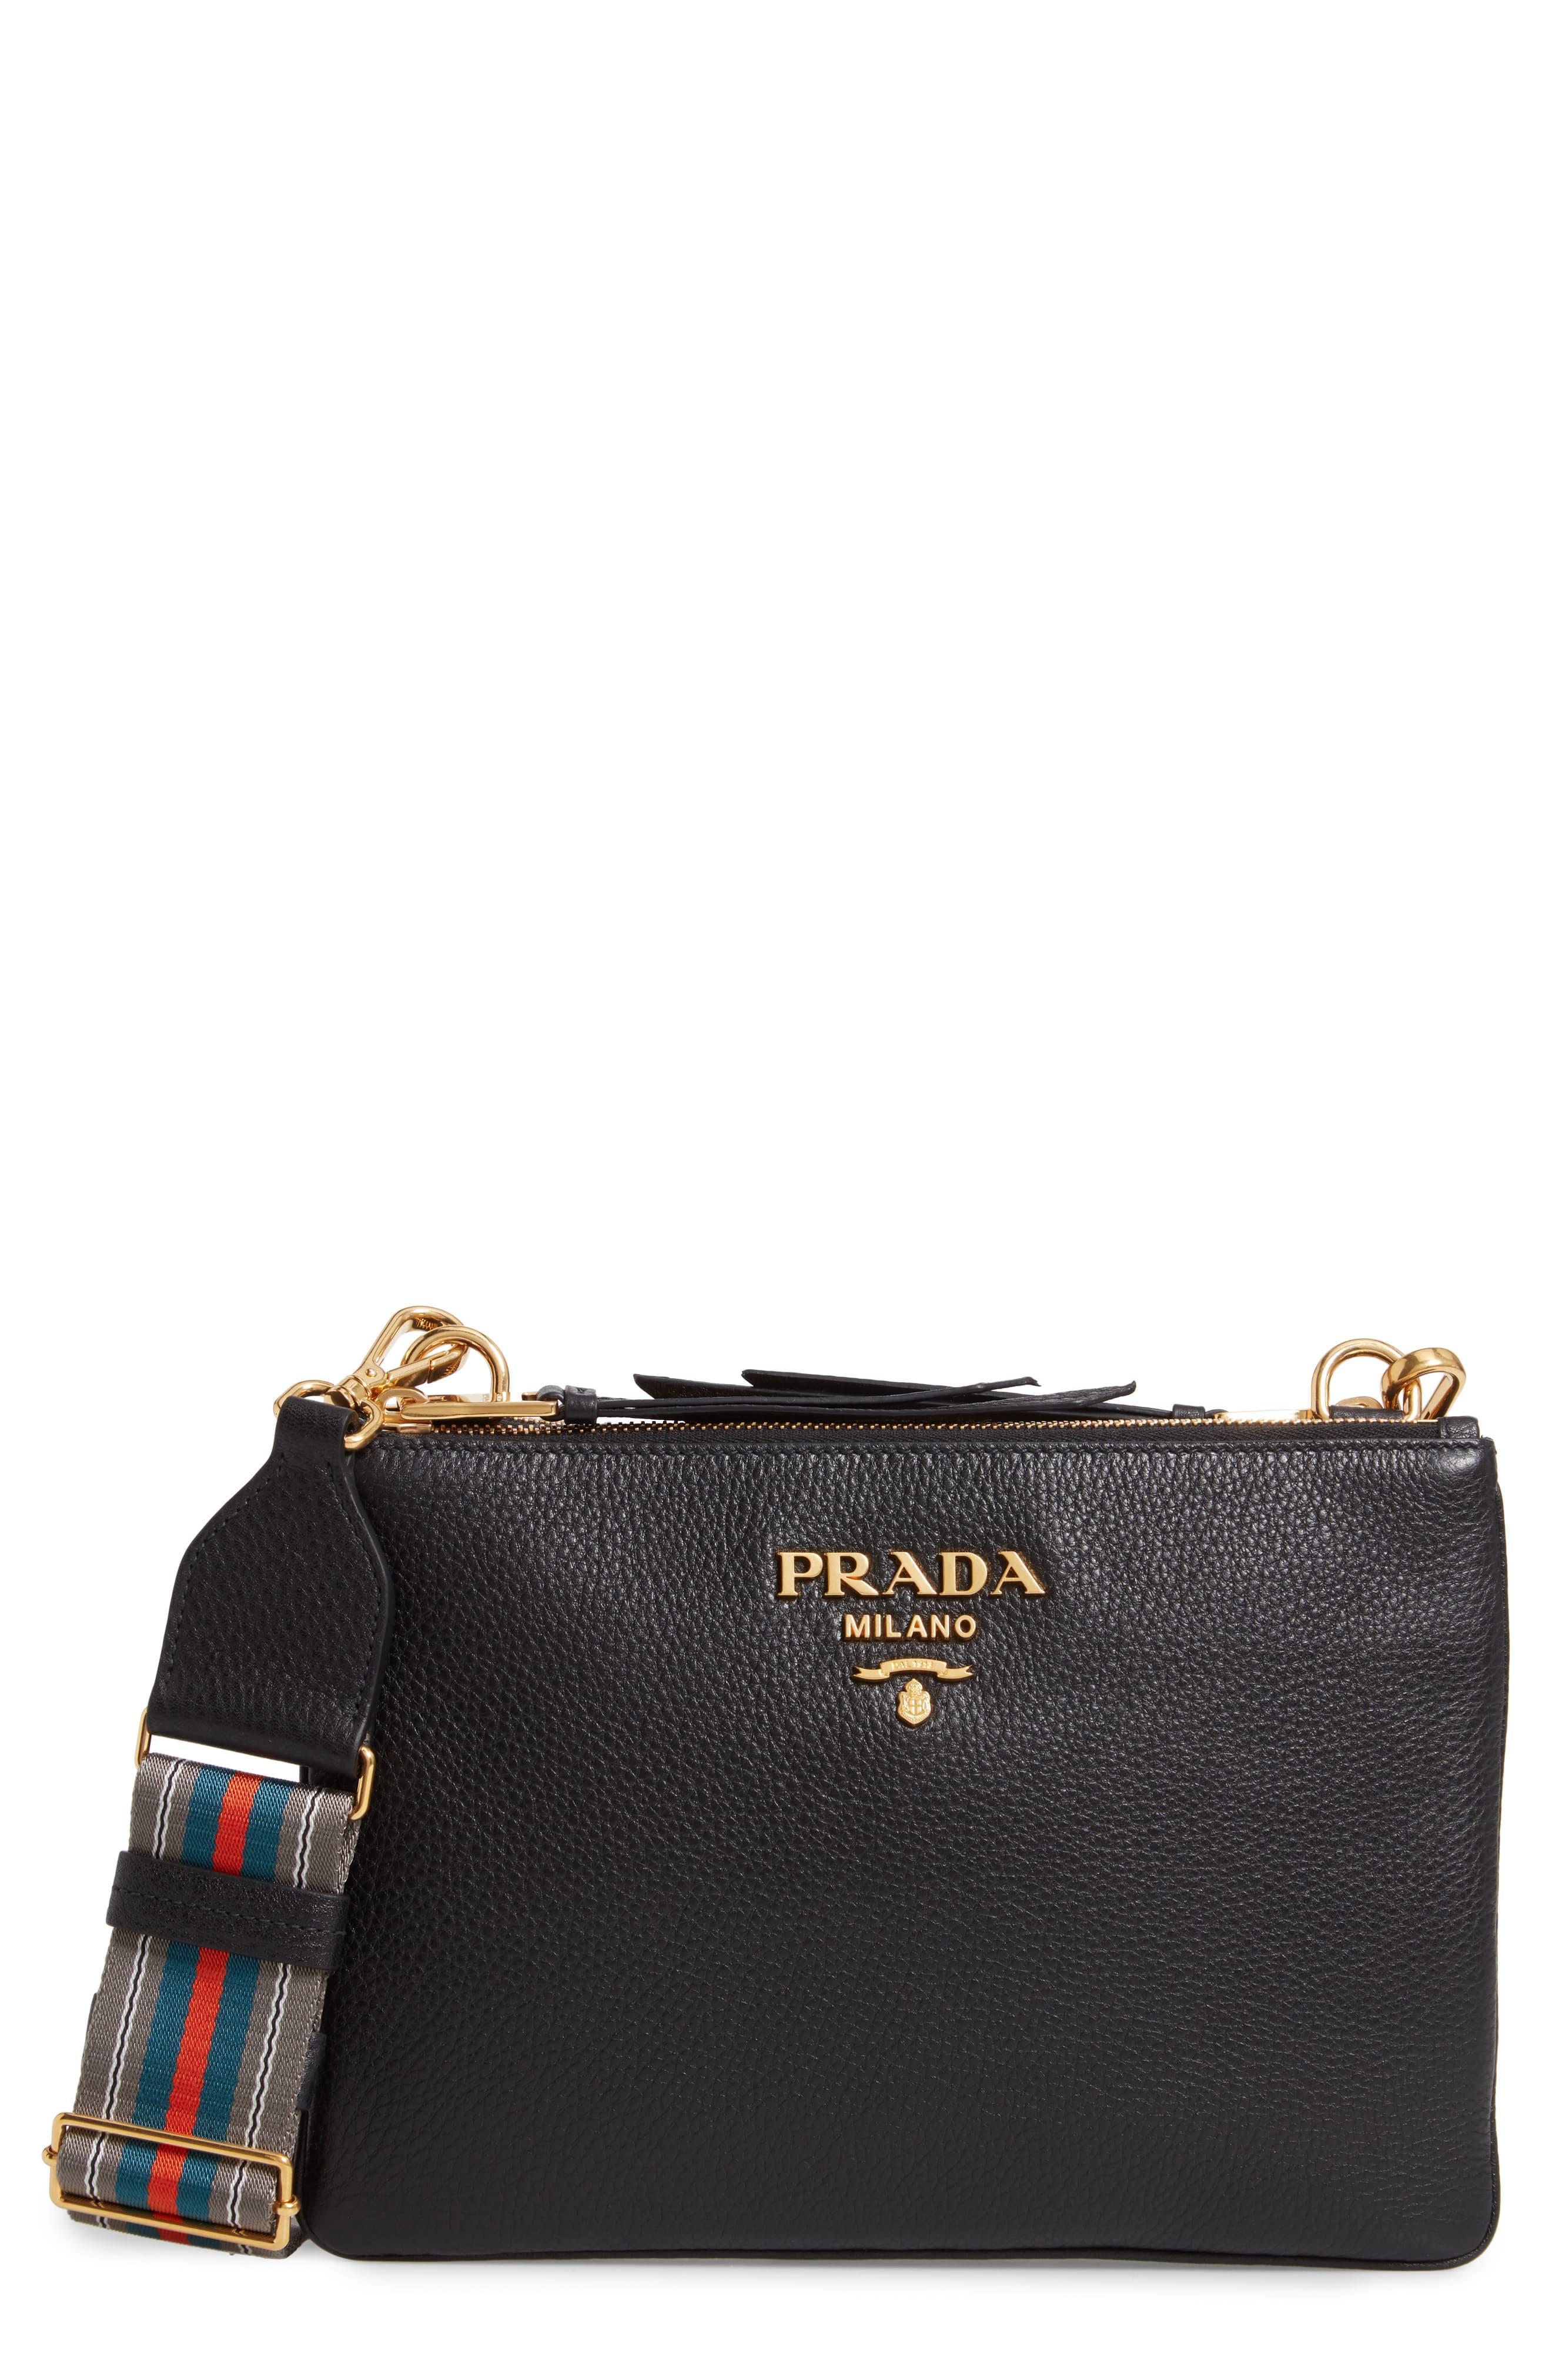 22abddbb38 Prada - Black Vitello Daino Double Compartment Leather Crossbody Bag -  Lyst. View fullscreen